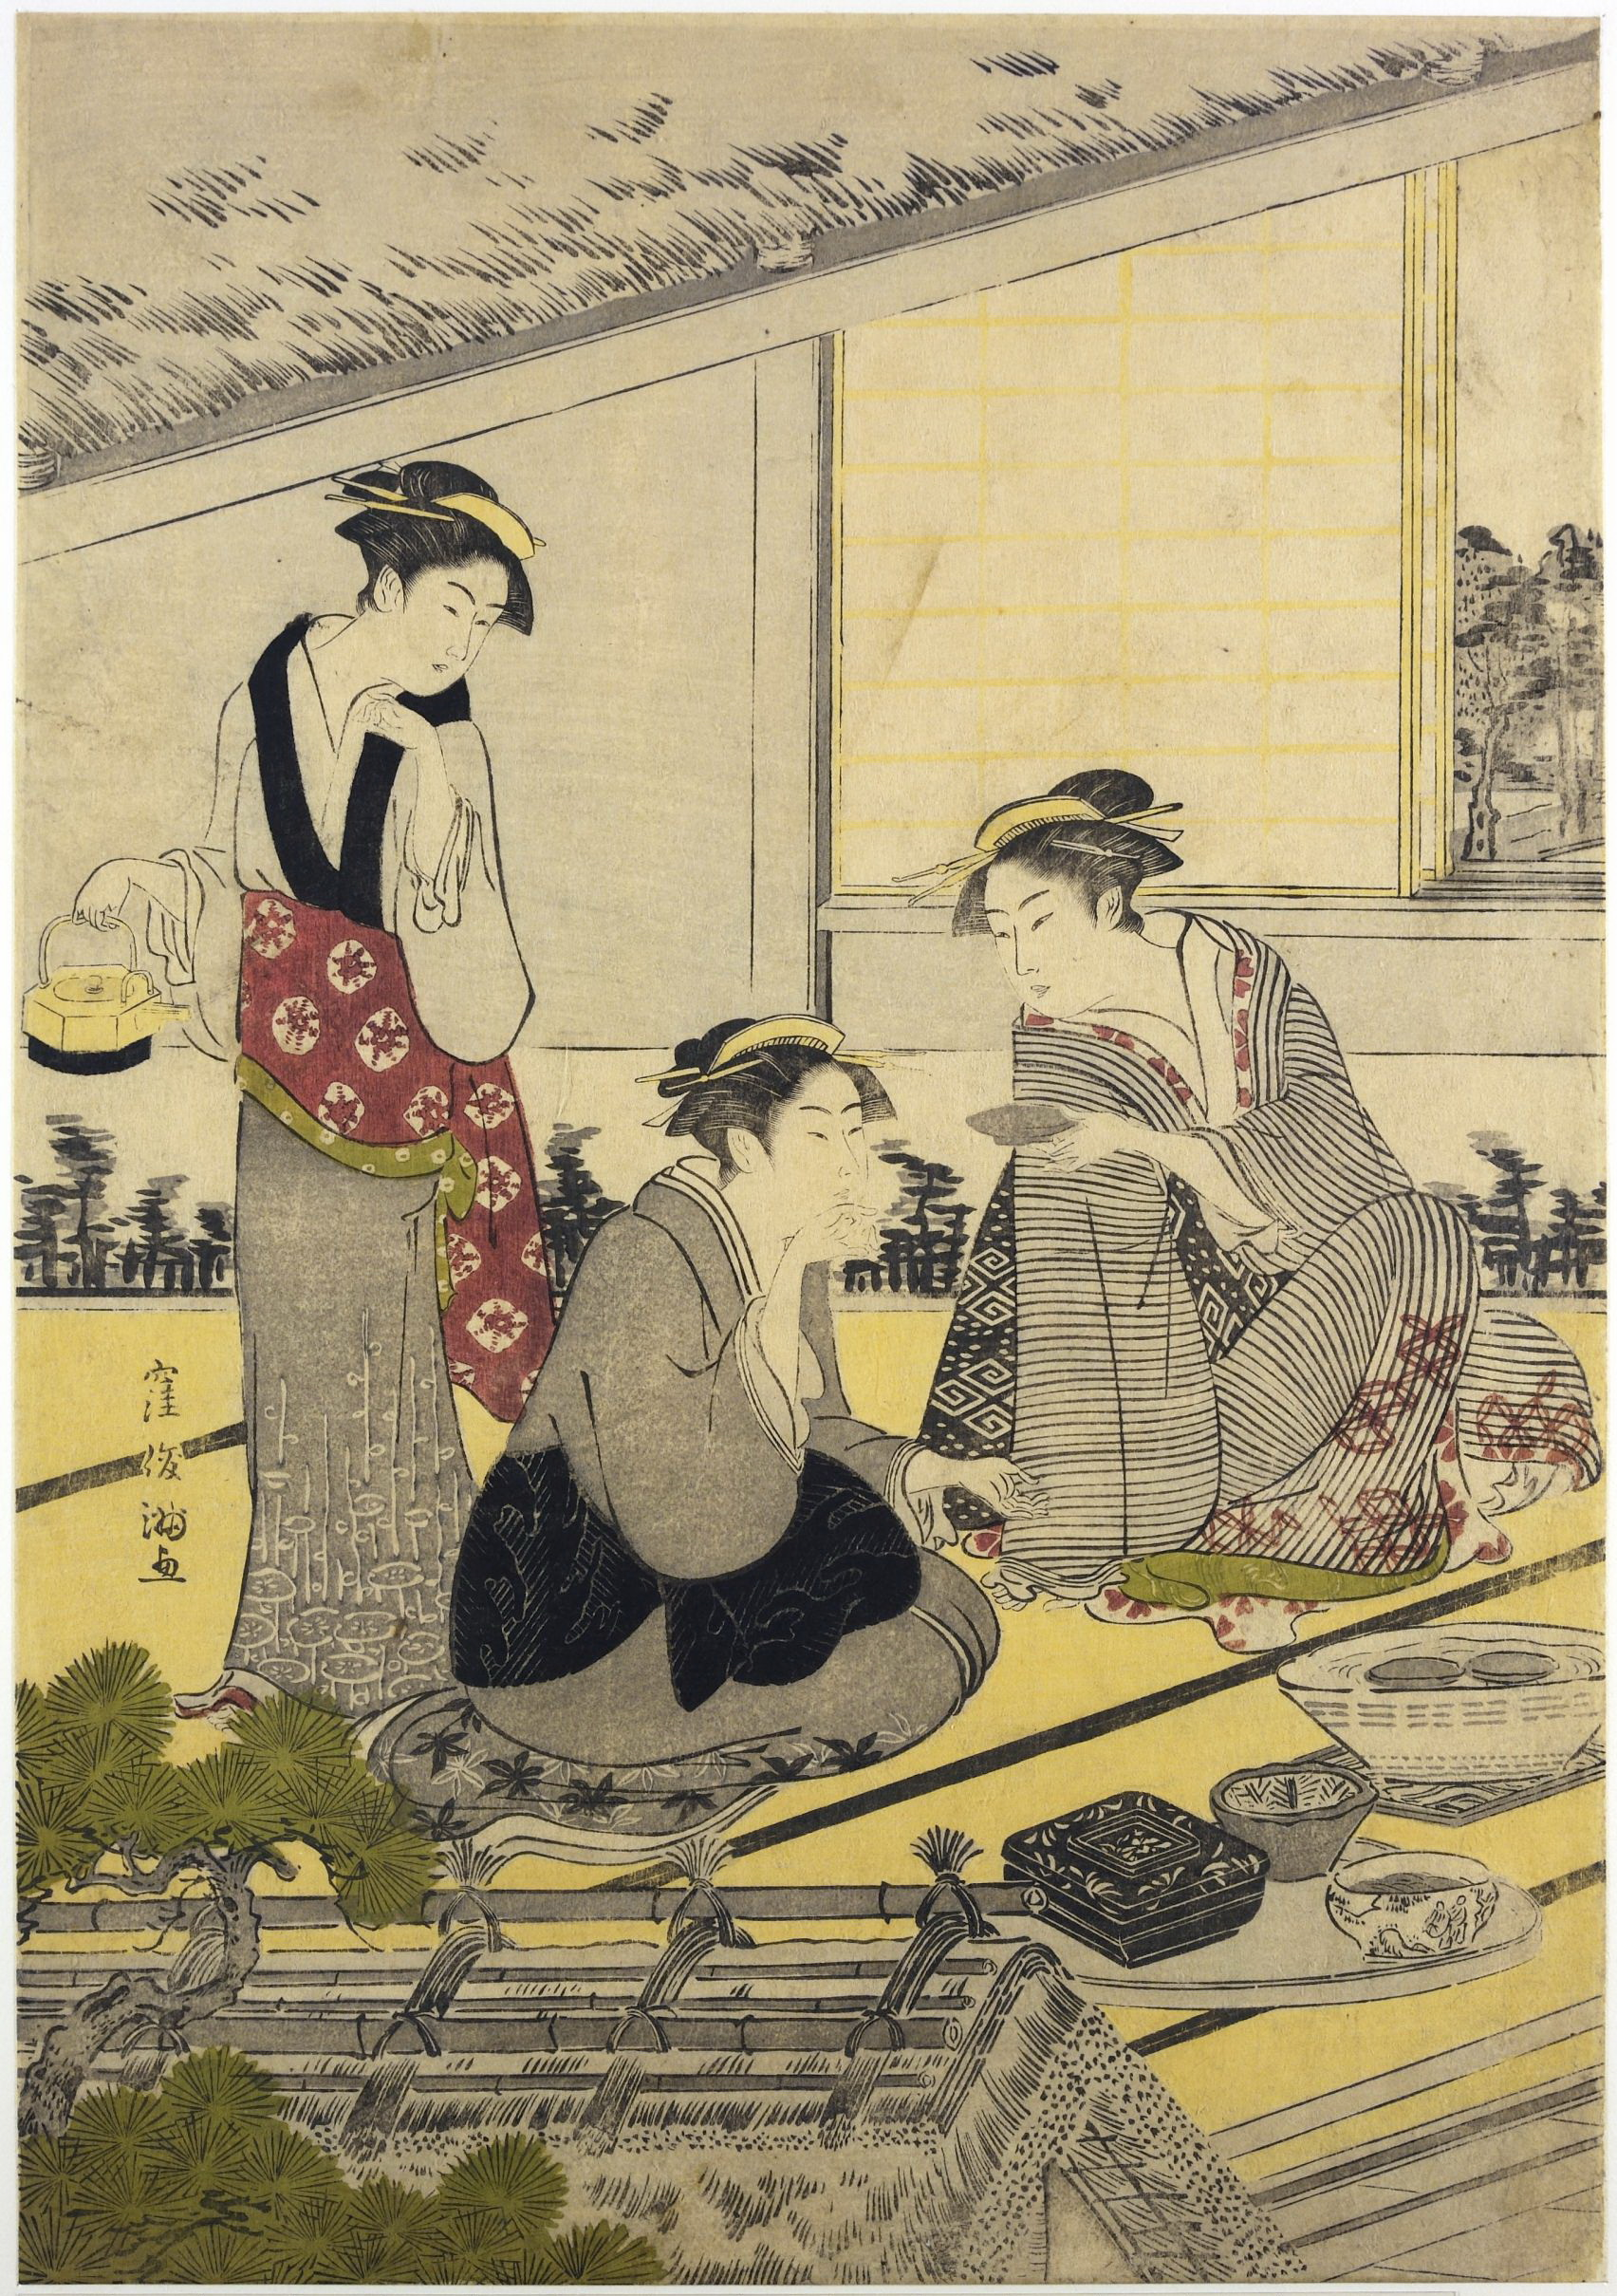 Триптих Сцена в ресторане Накадая в Микодзима_1787-1788_лист 1_320х220 мм